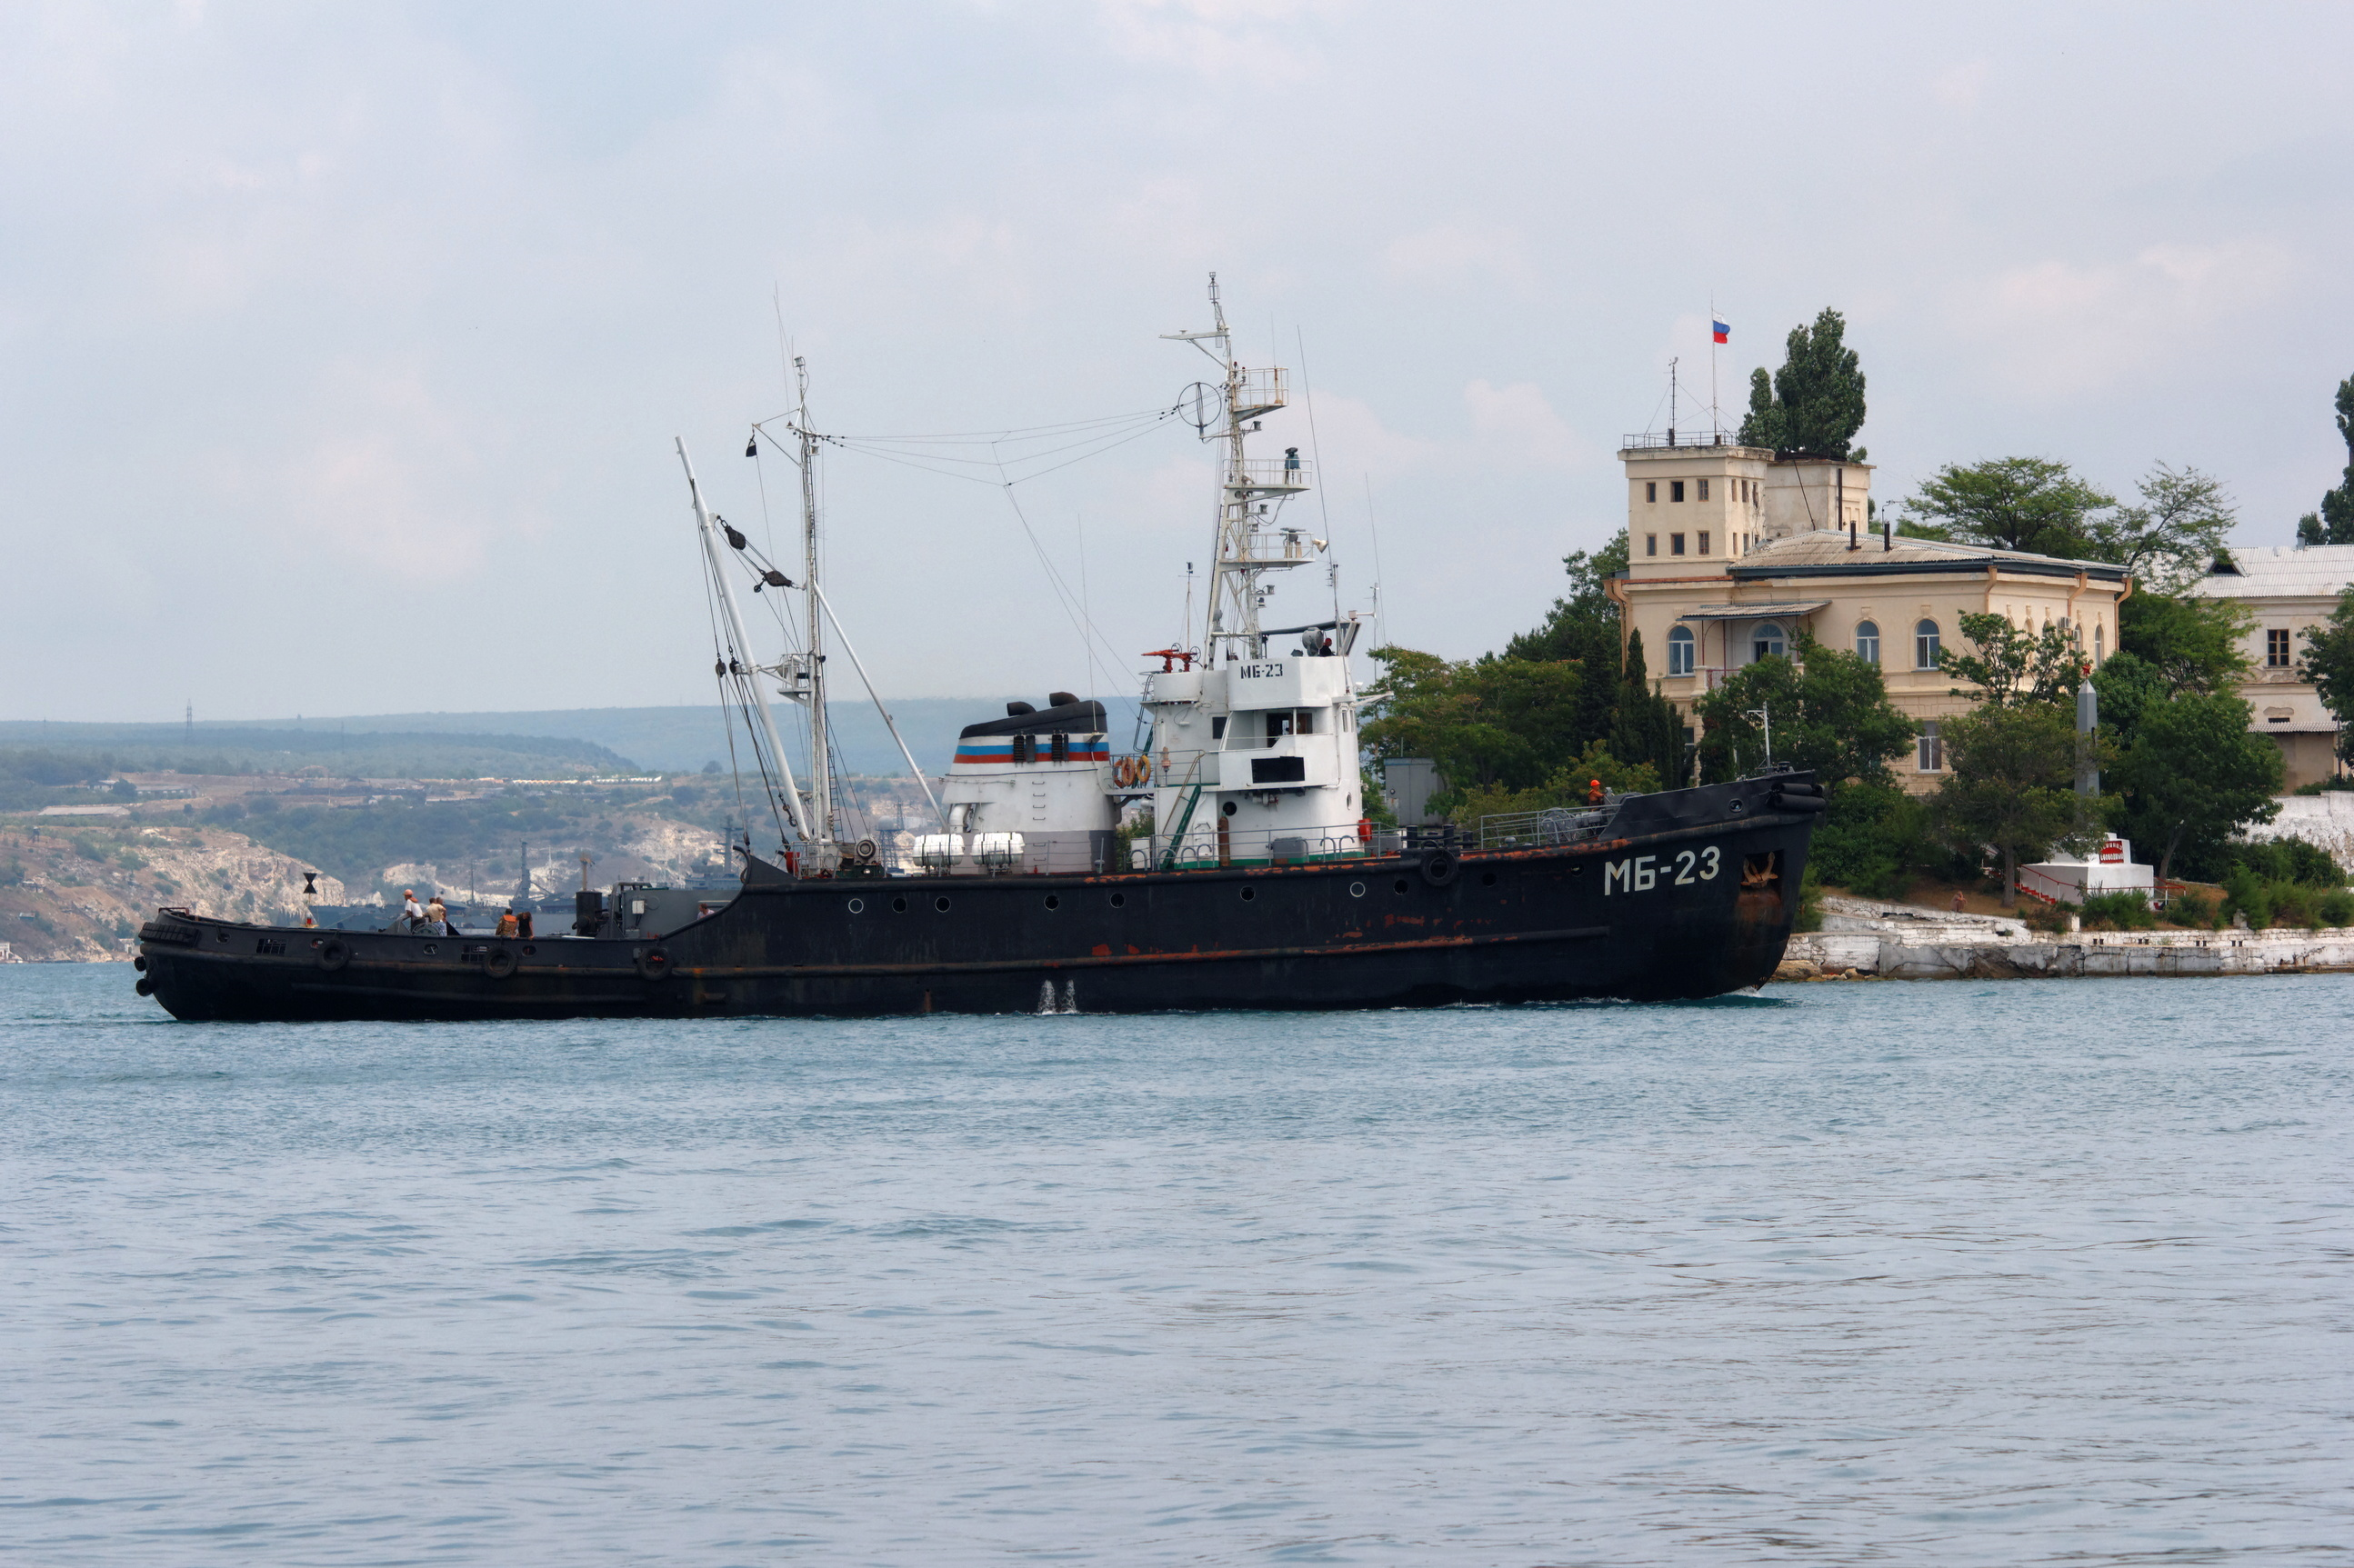 File:Sevastopol Seagoing tugboat MB-23 IMG 3963 1725.jpg